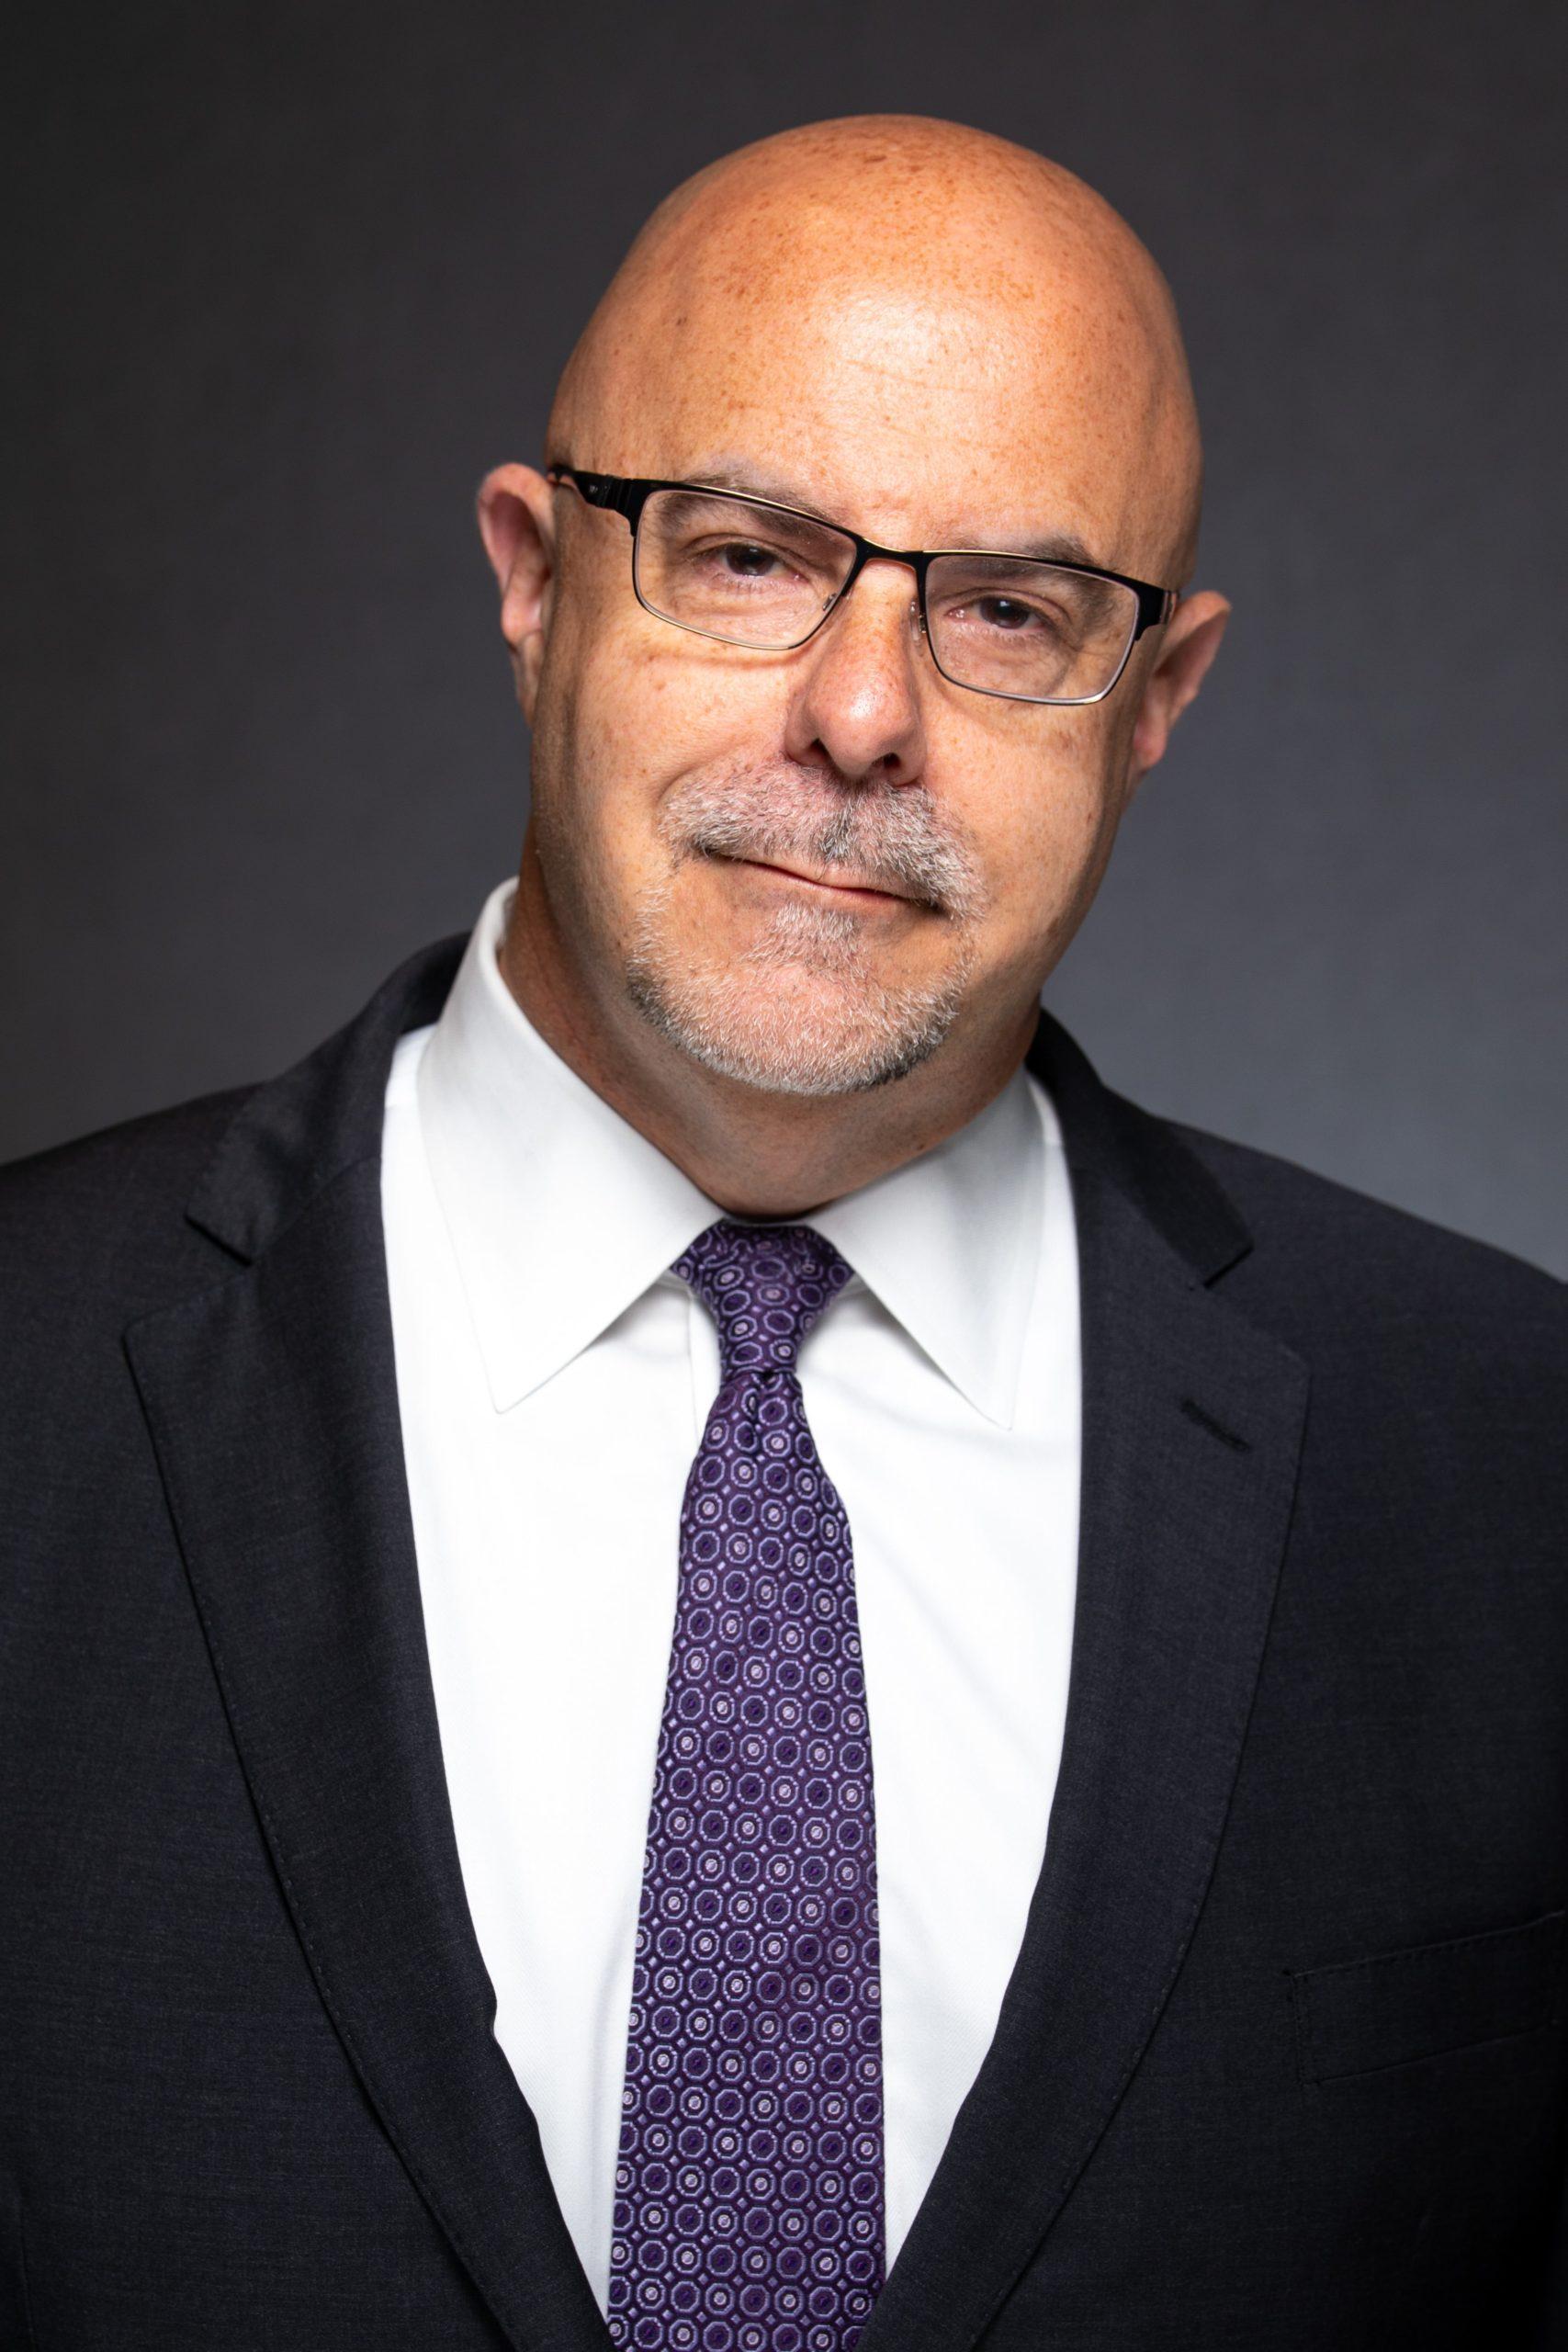 Robert Ranco